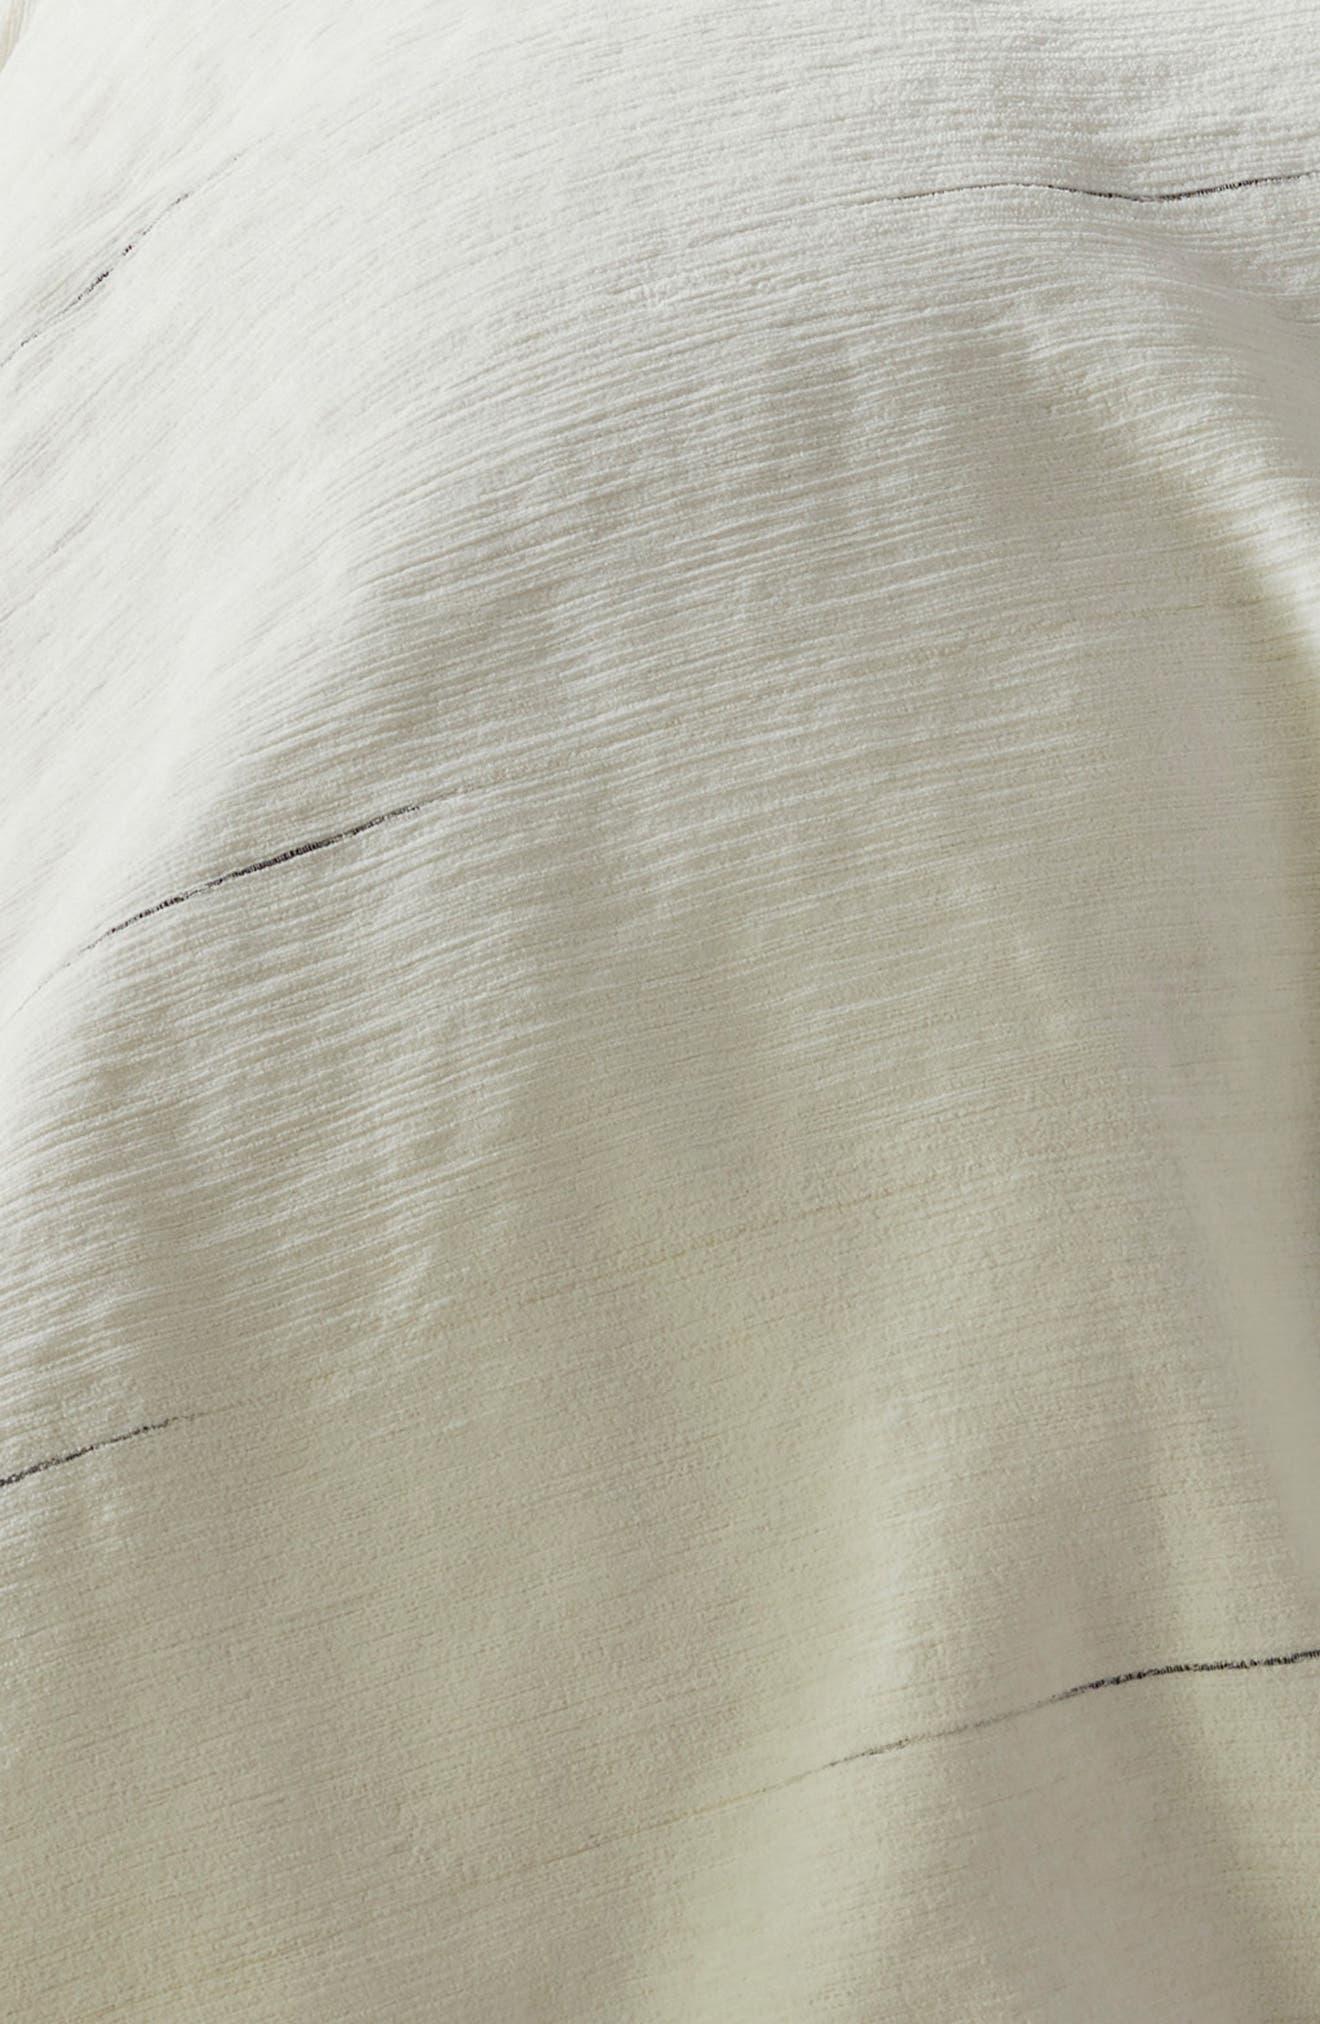 Space Dyed Stripe Duvet Cover,                             Alternate thumbnail 3, color,                             IVORY MULTI